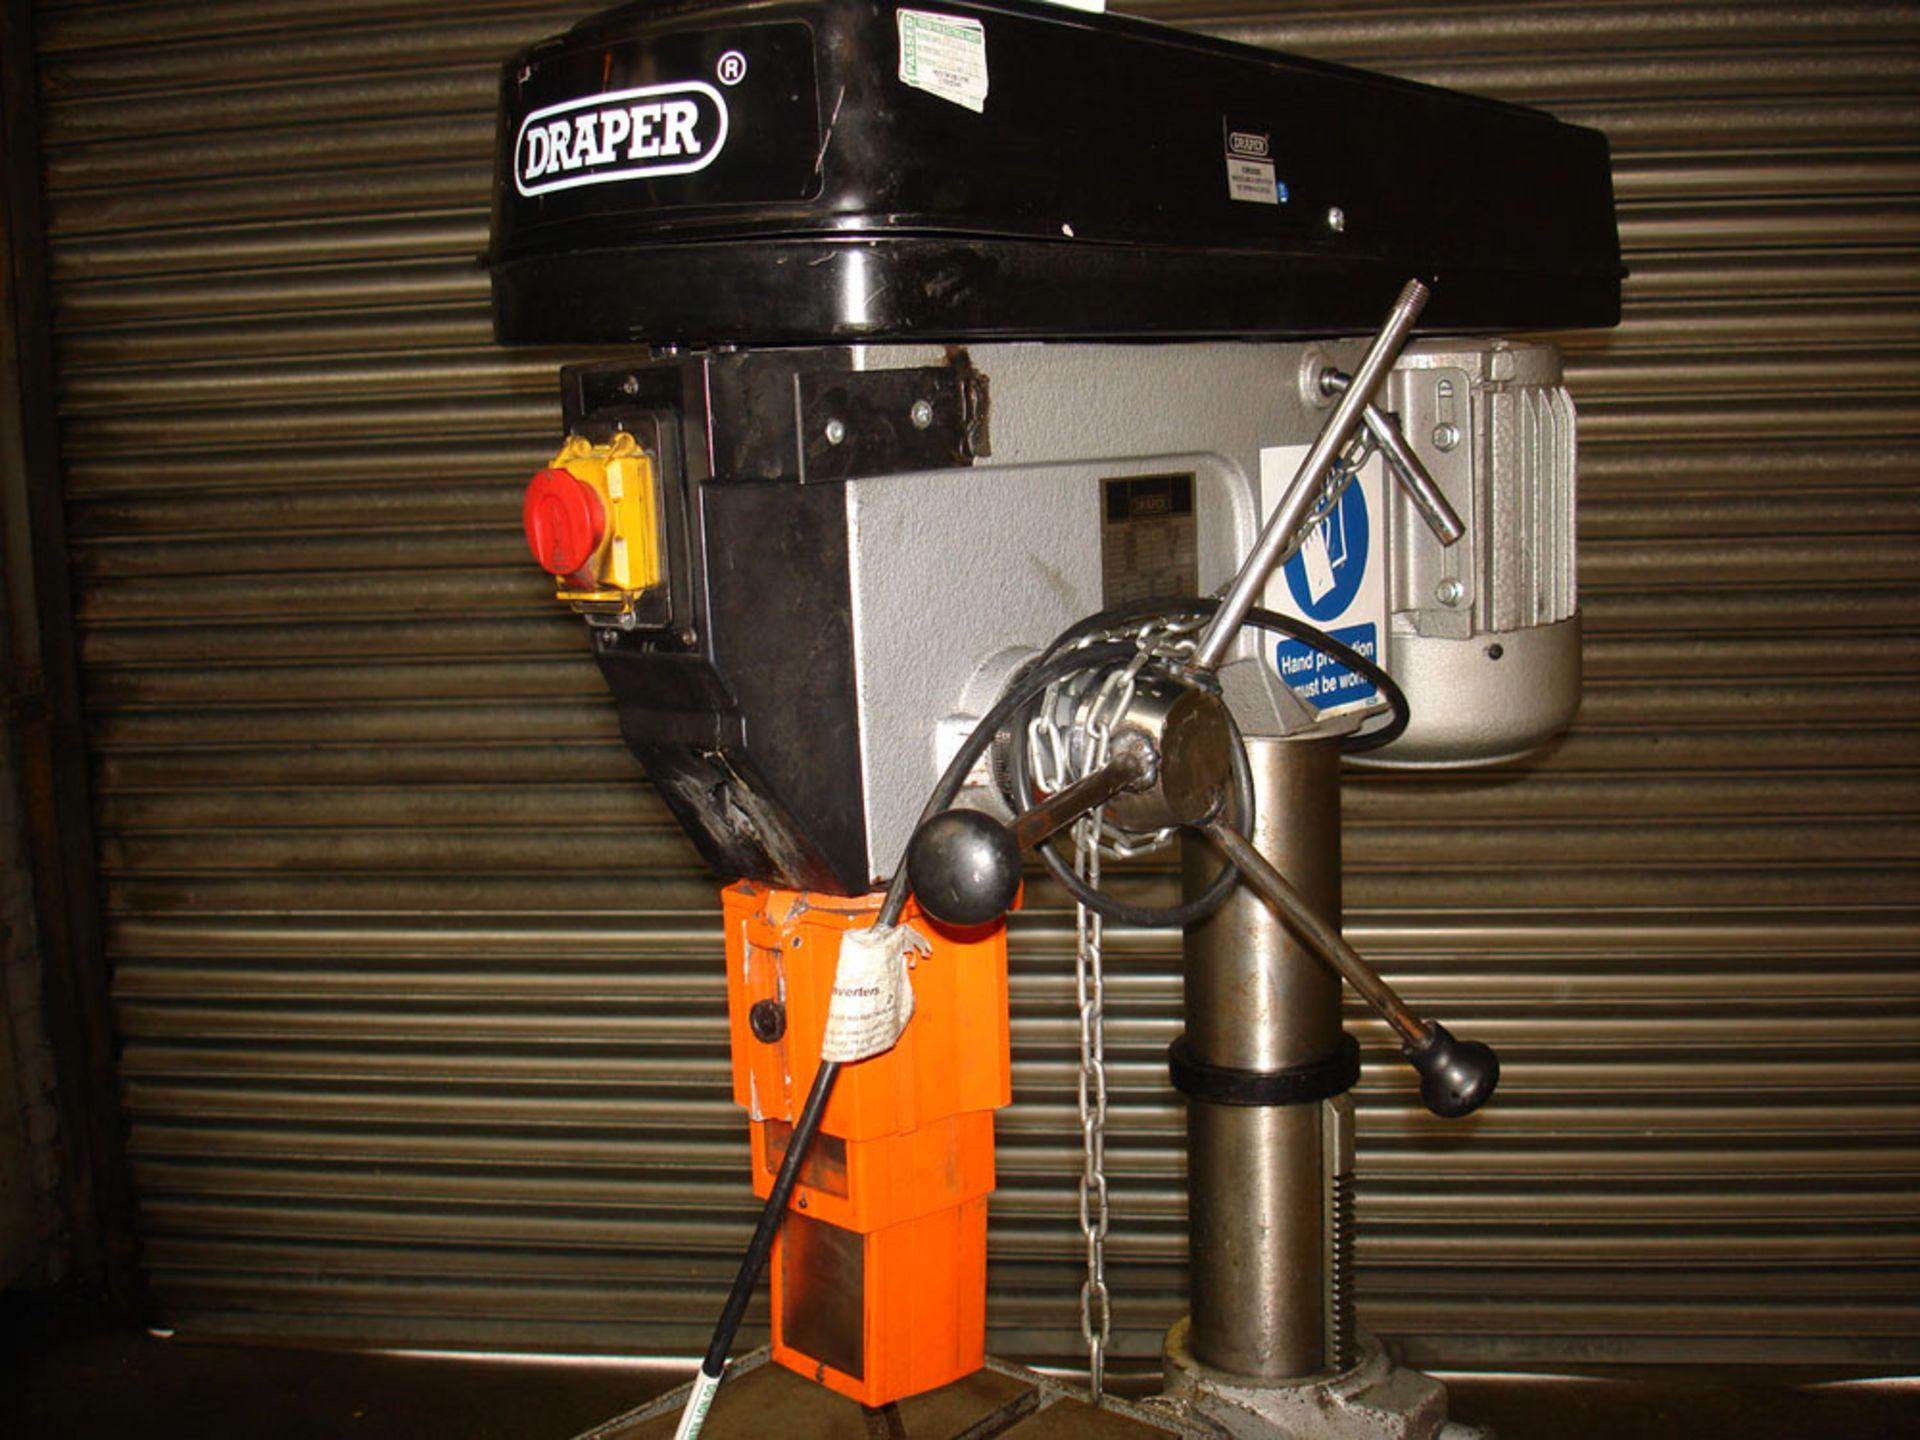 Draper Pillar Drill. Capacity 25 mm. 3 Morse Taper. - Image 2 of 5